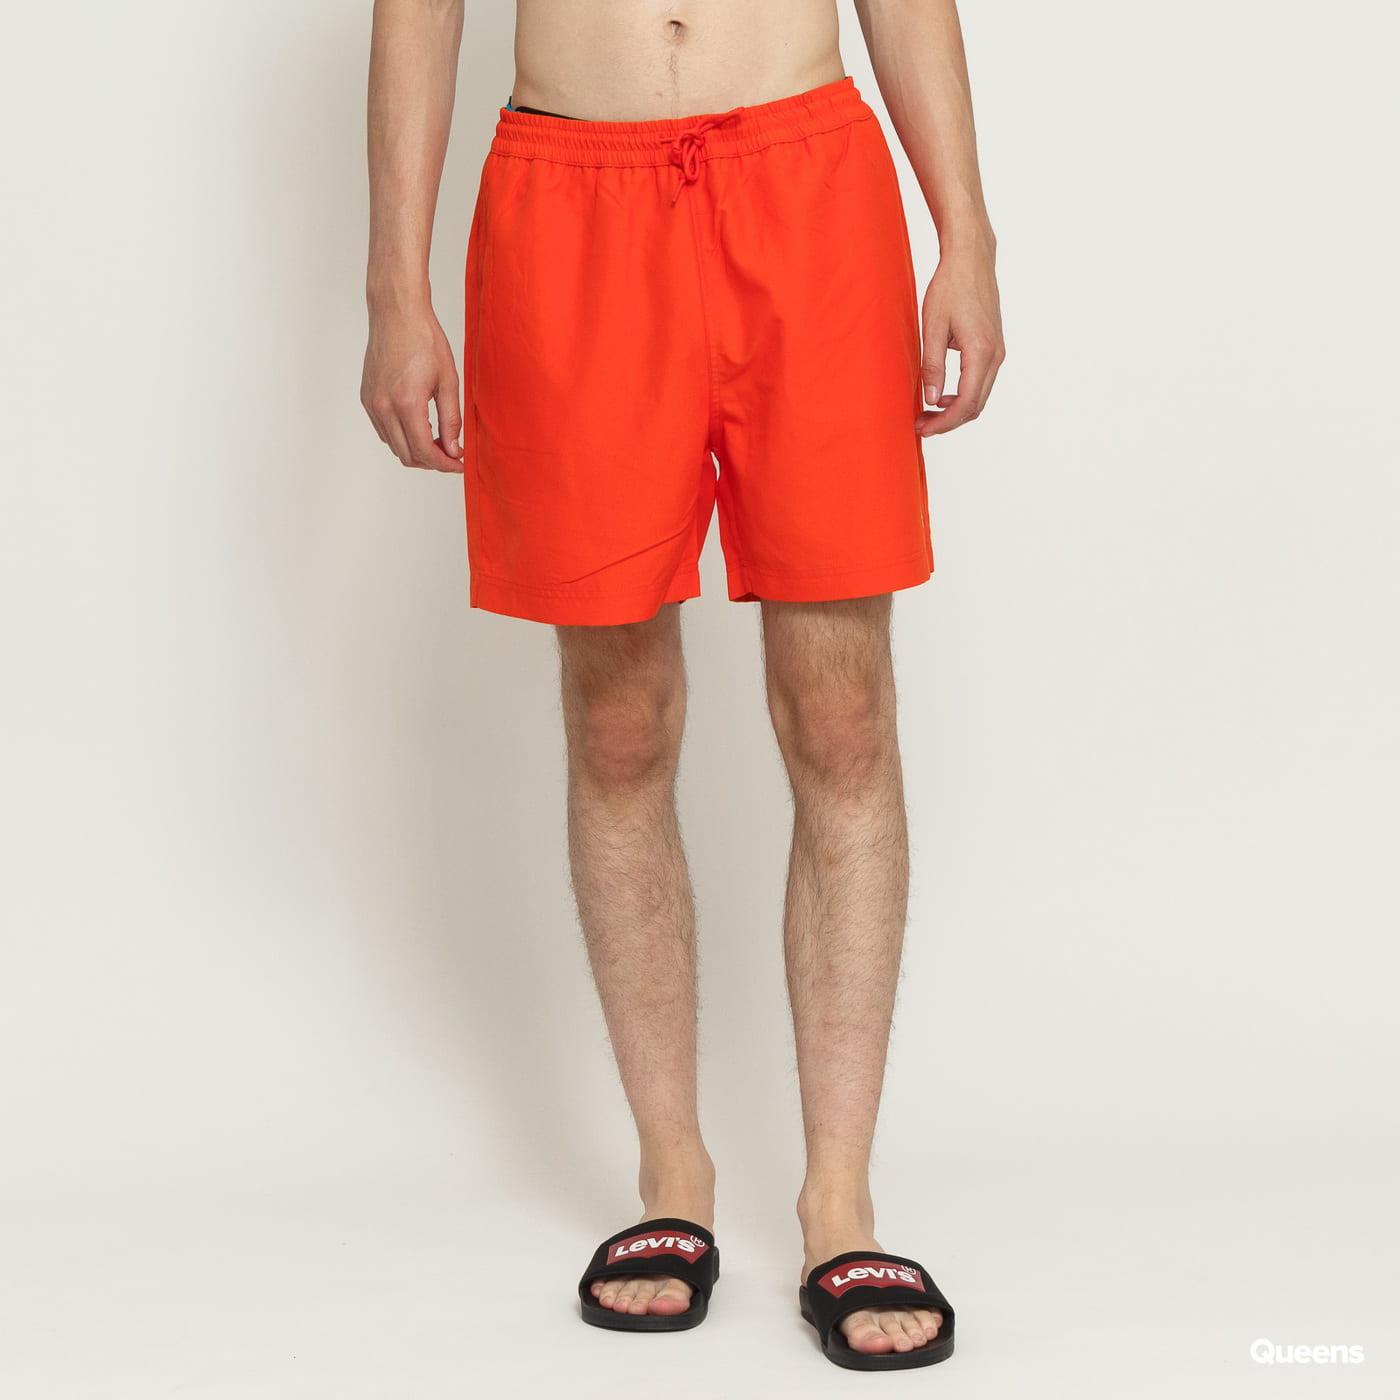 cbad4555b7d37 Men Swim Shorts Carhartt WIP Chase Swim Trunks orange (I026235.PE.90.03) –  Queens 💚